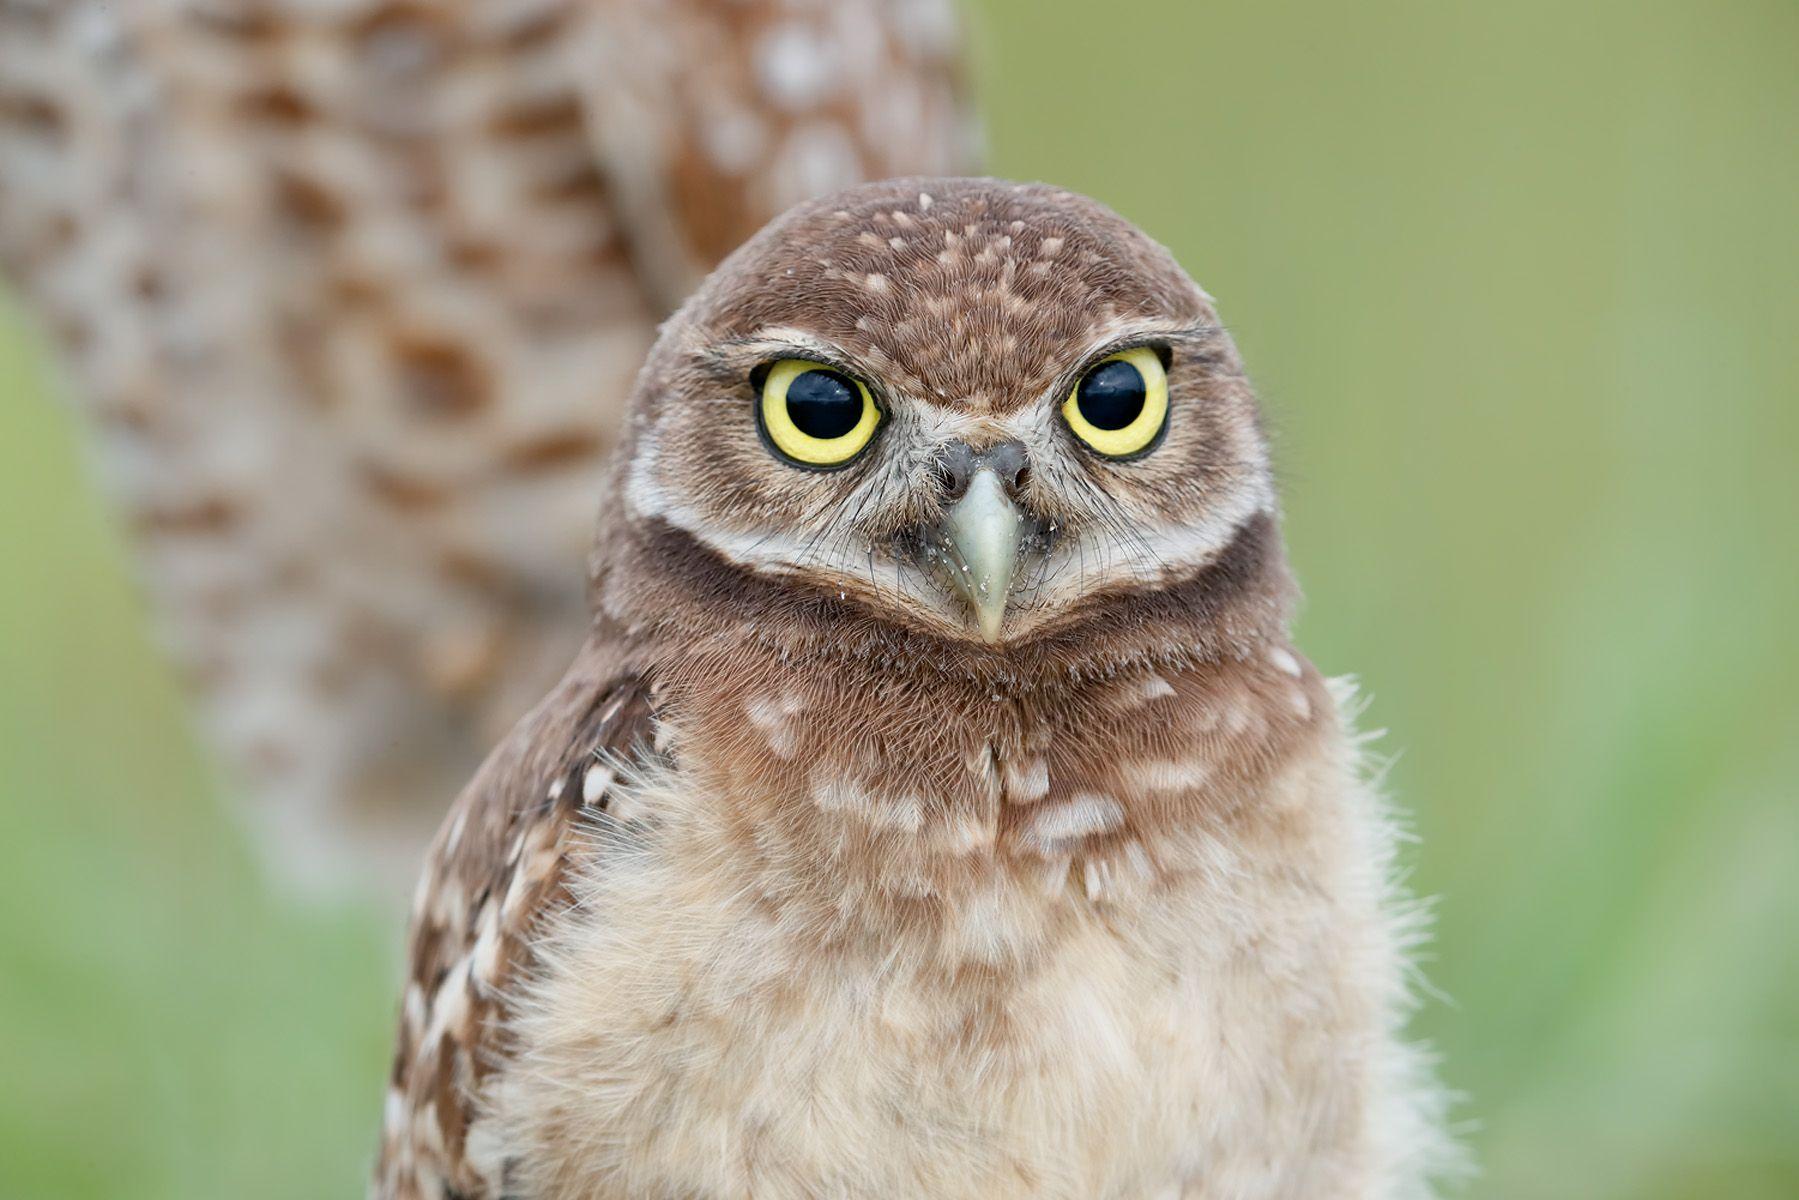 Burrowing owl chick_A3I9323- Boca Raton Airport, FL, USA.jpg